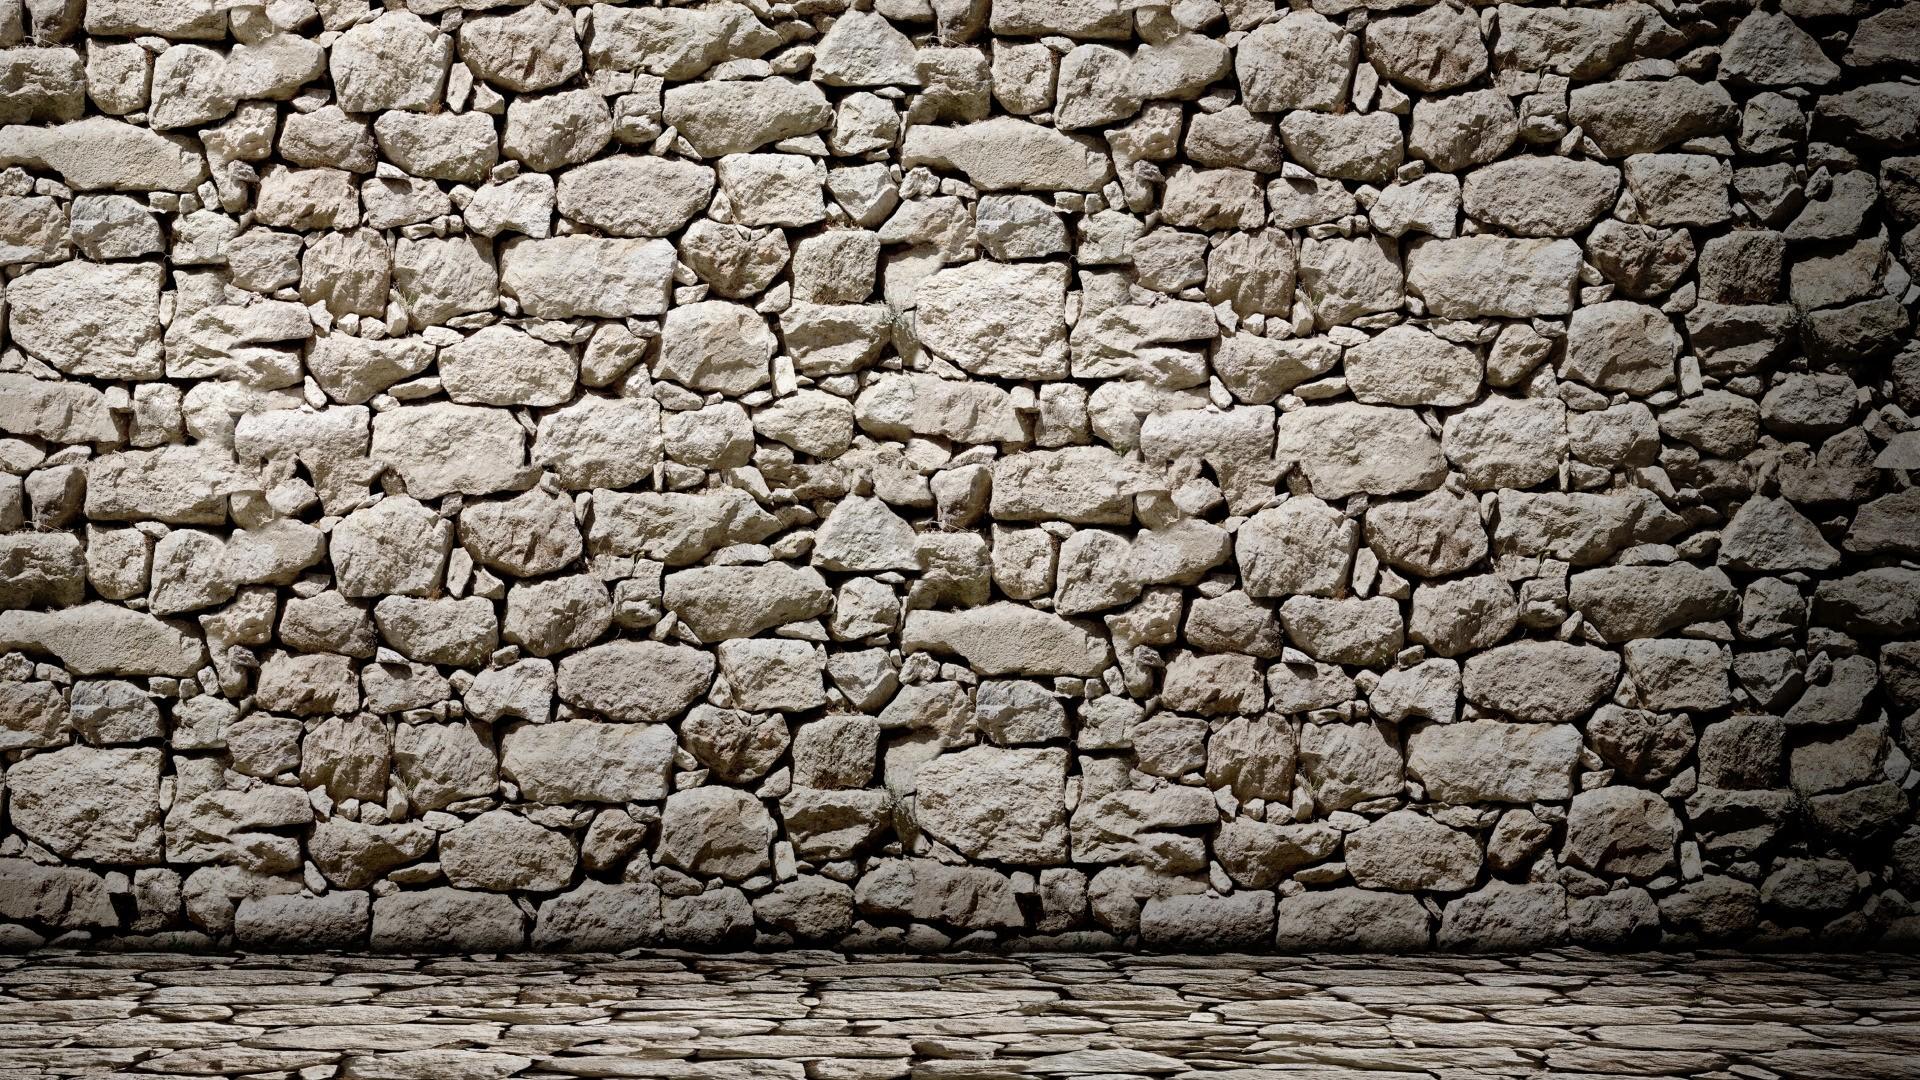 Texture Stone desktop wallpaper hd